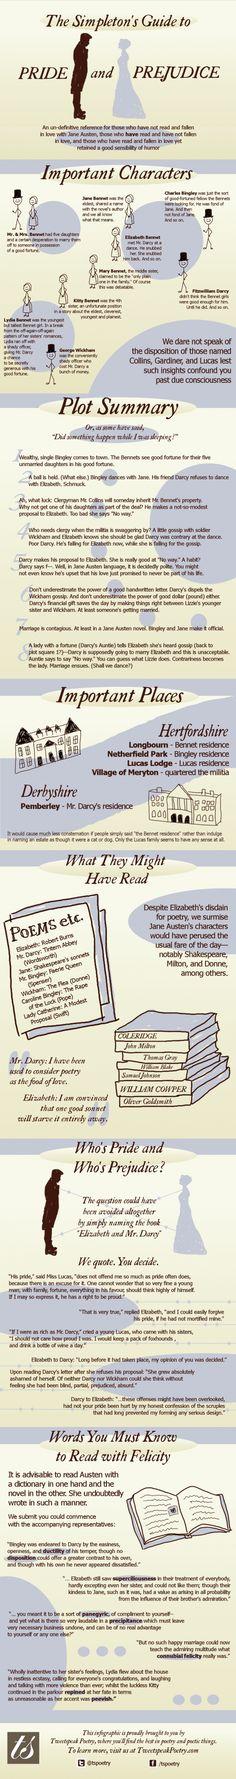 Pride and Prejudice Infographic